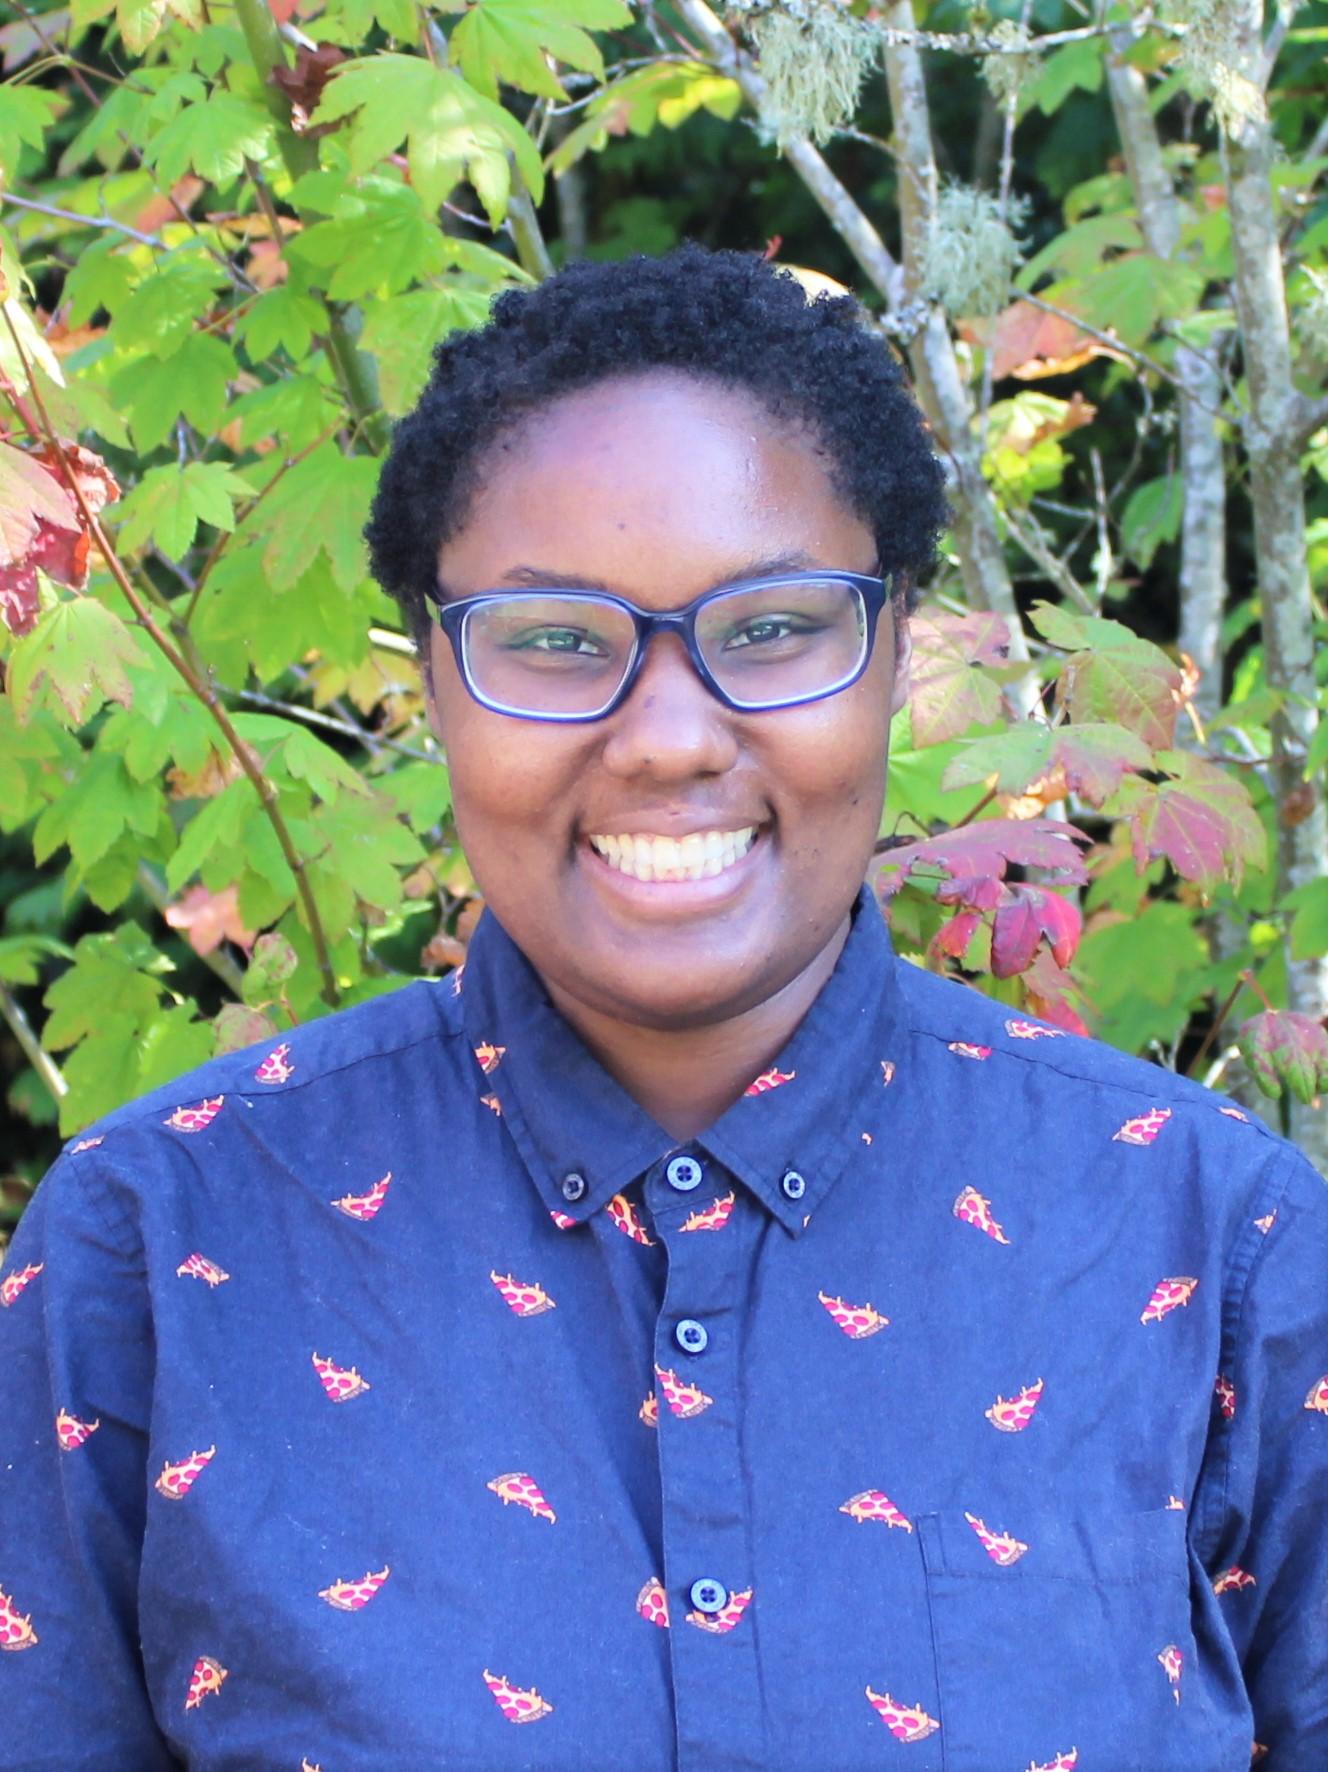 IslandWood Graduate Program student Tiffany Barber